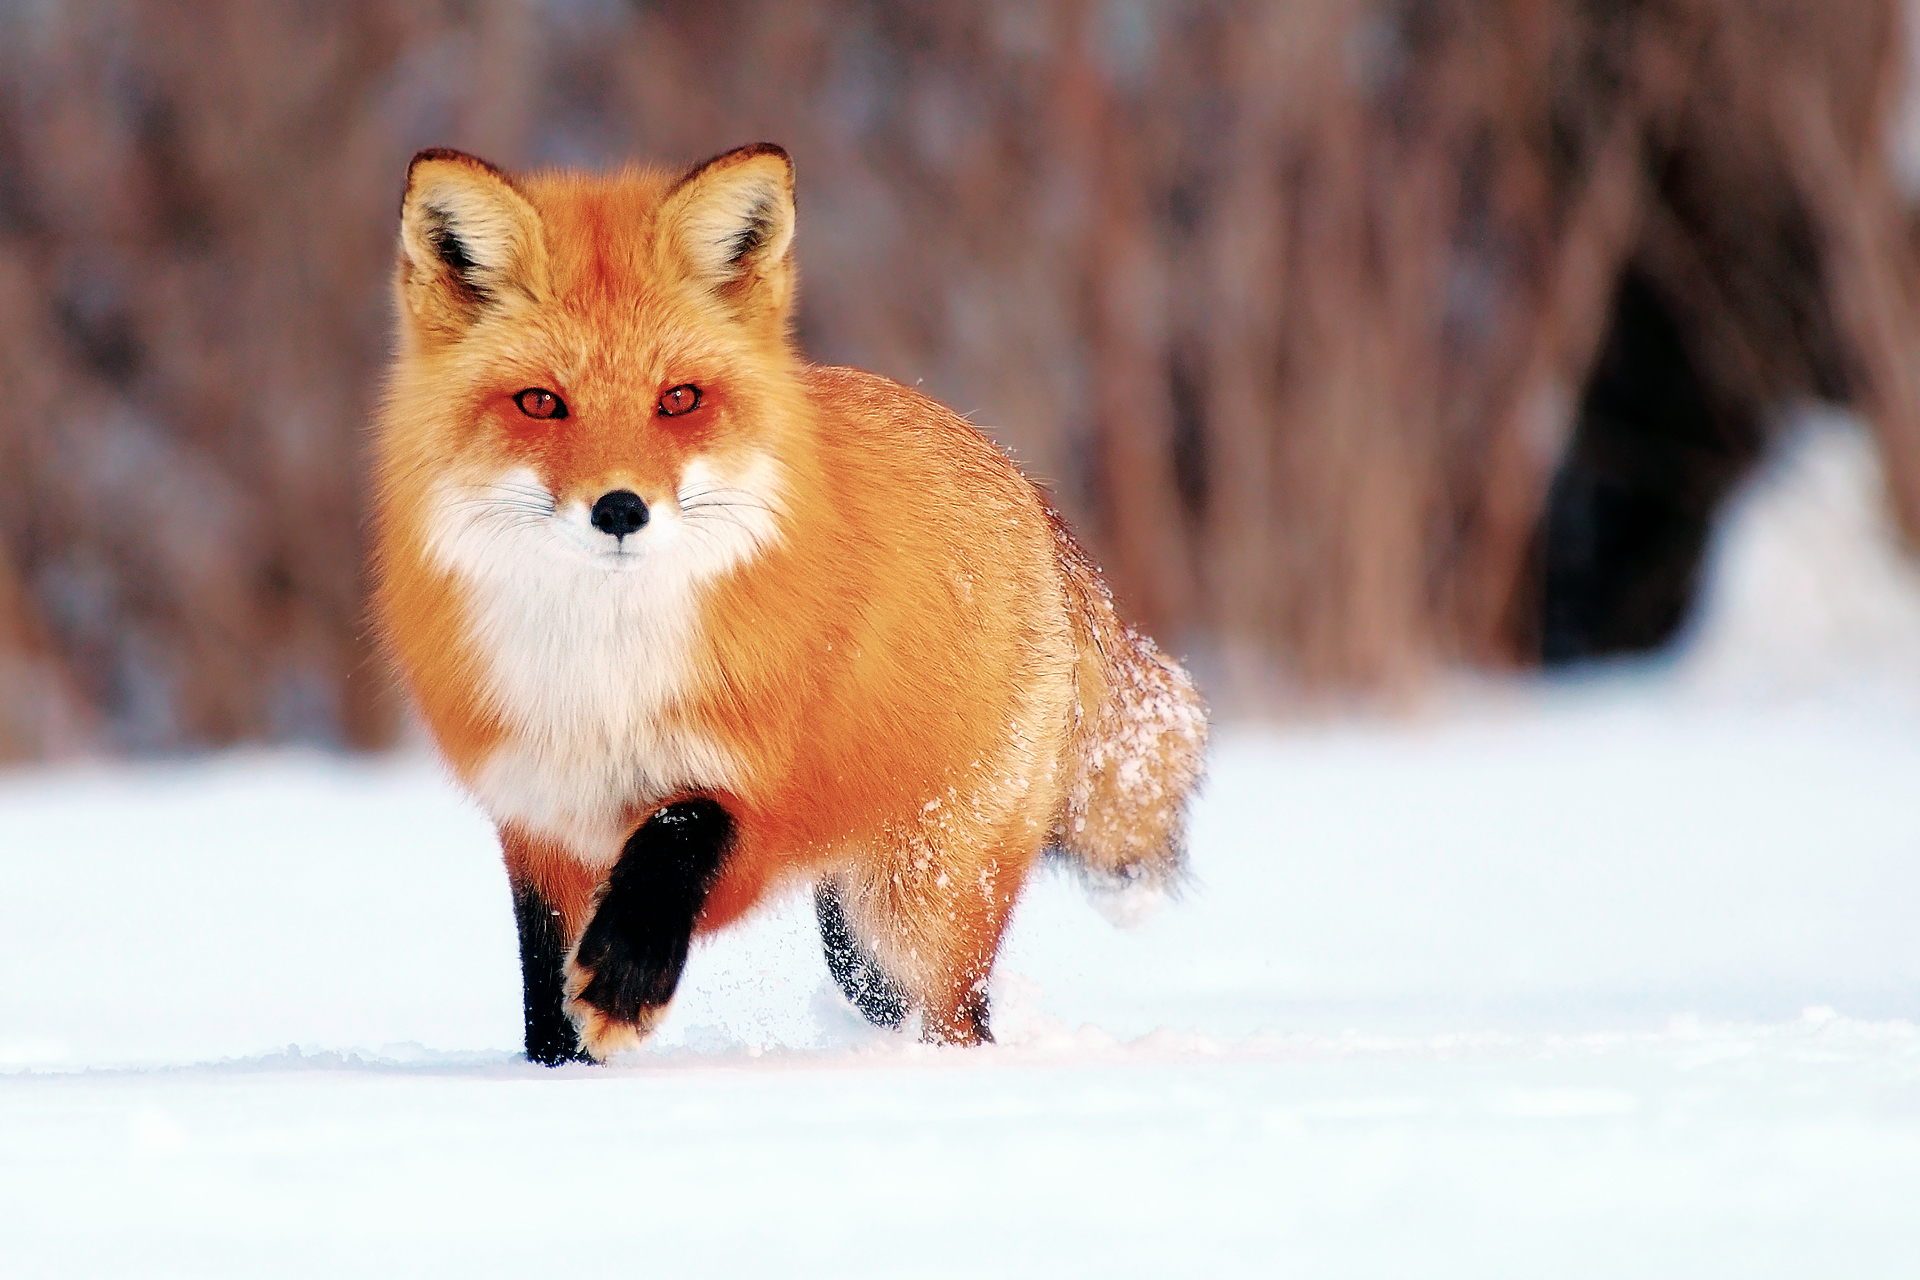 картинки лиса с лисятами для детей